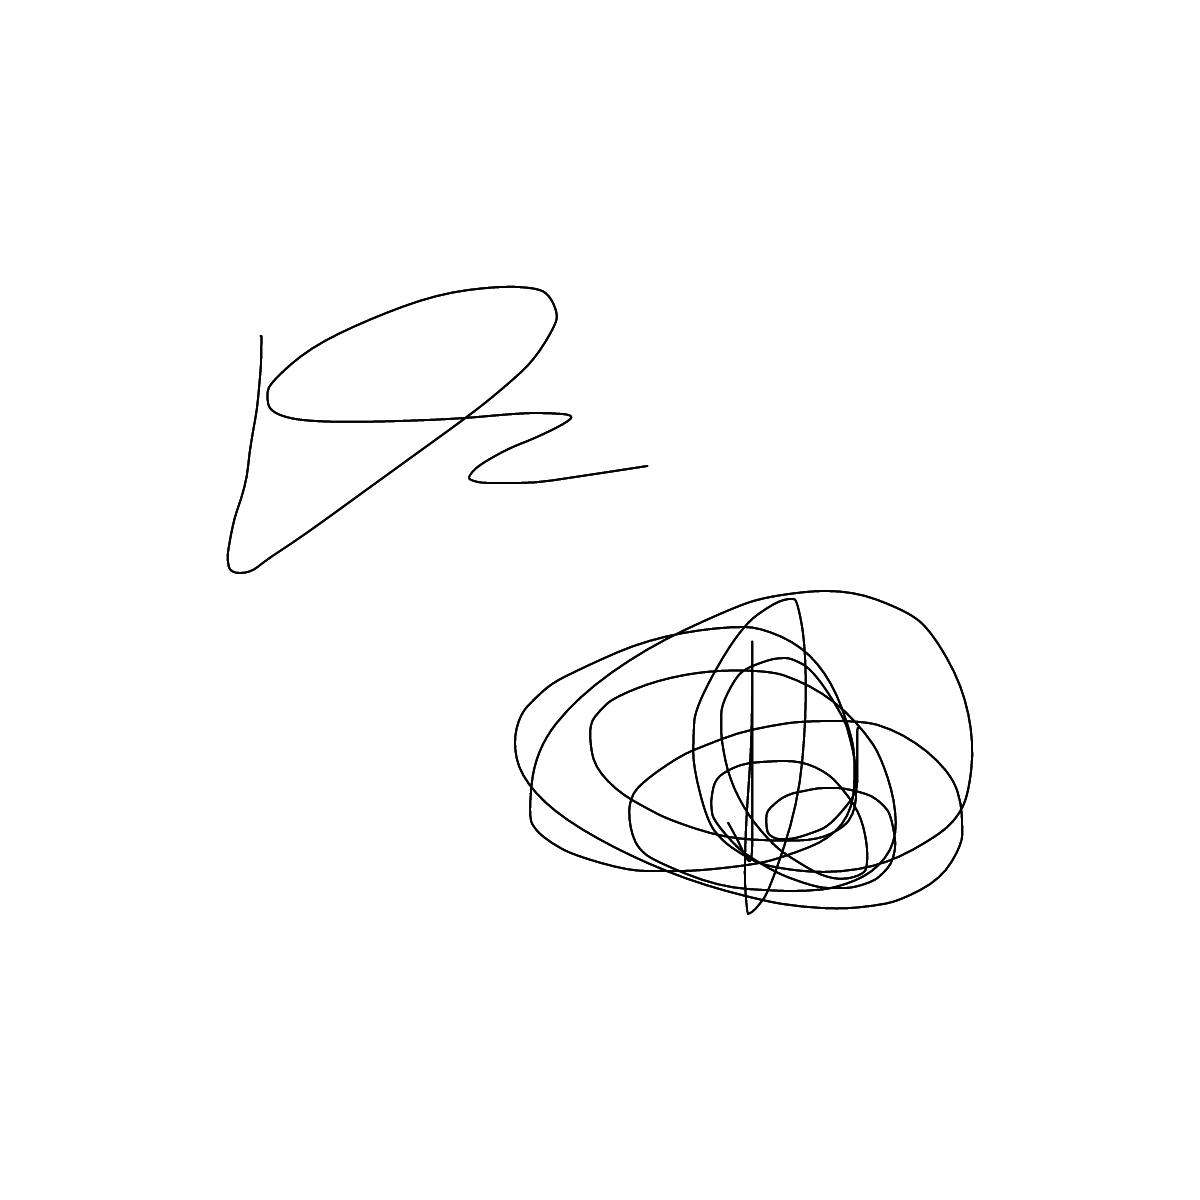 BAAAM drawing#23344 lat:52.2235183715820300lng: 21.0915946960449220